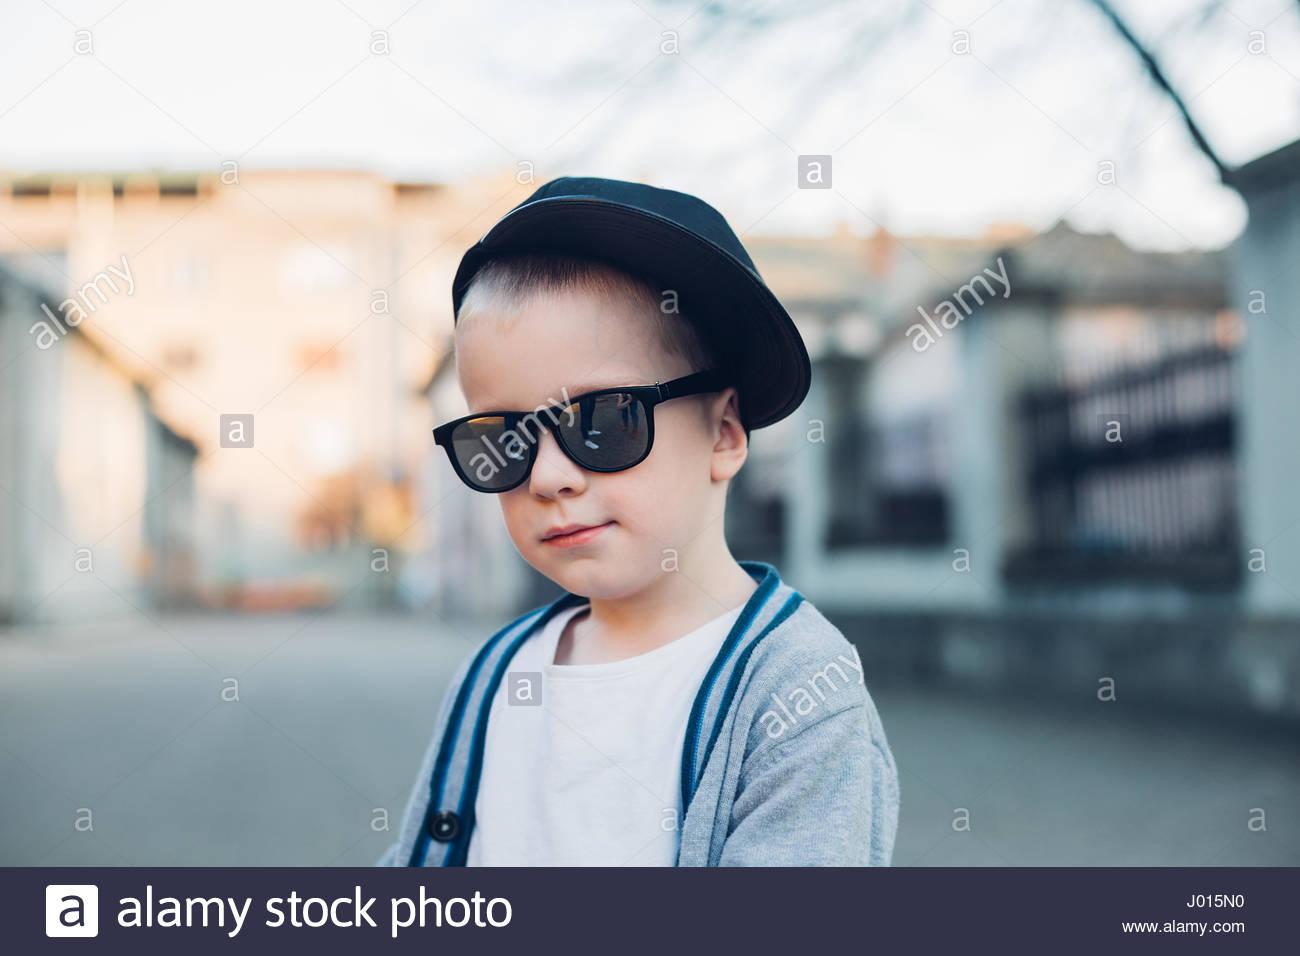 58974931125e Cool kid - super cute kid wearing sunglasses Stock Photo: 137709404 ...